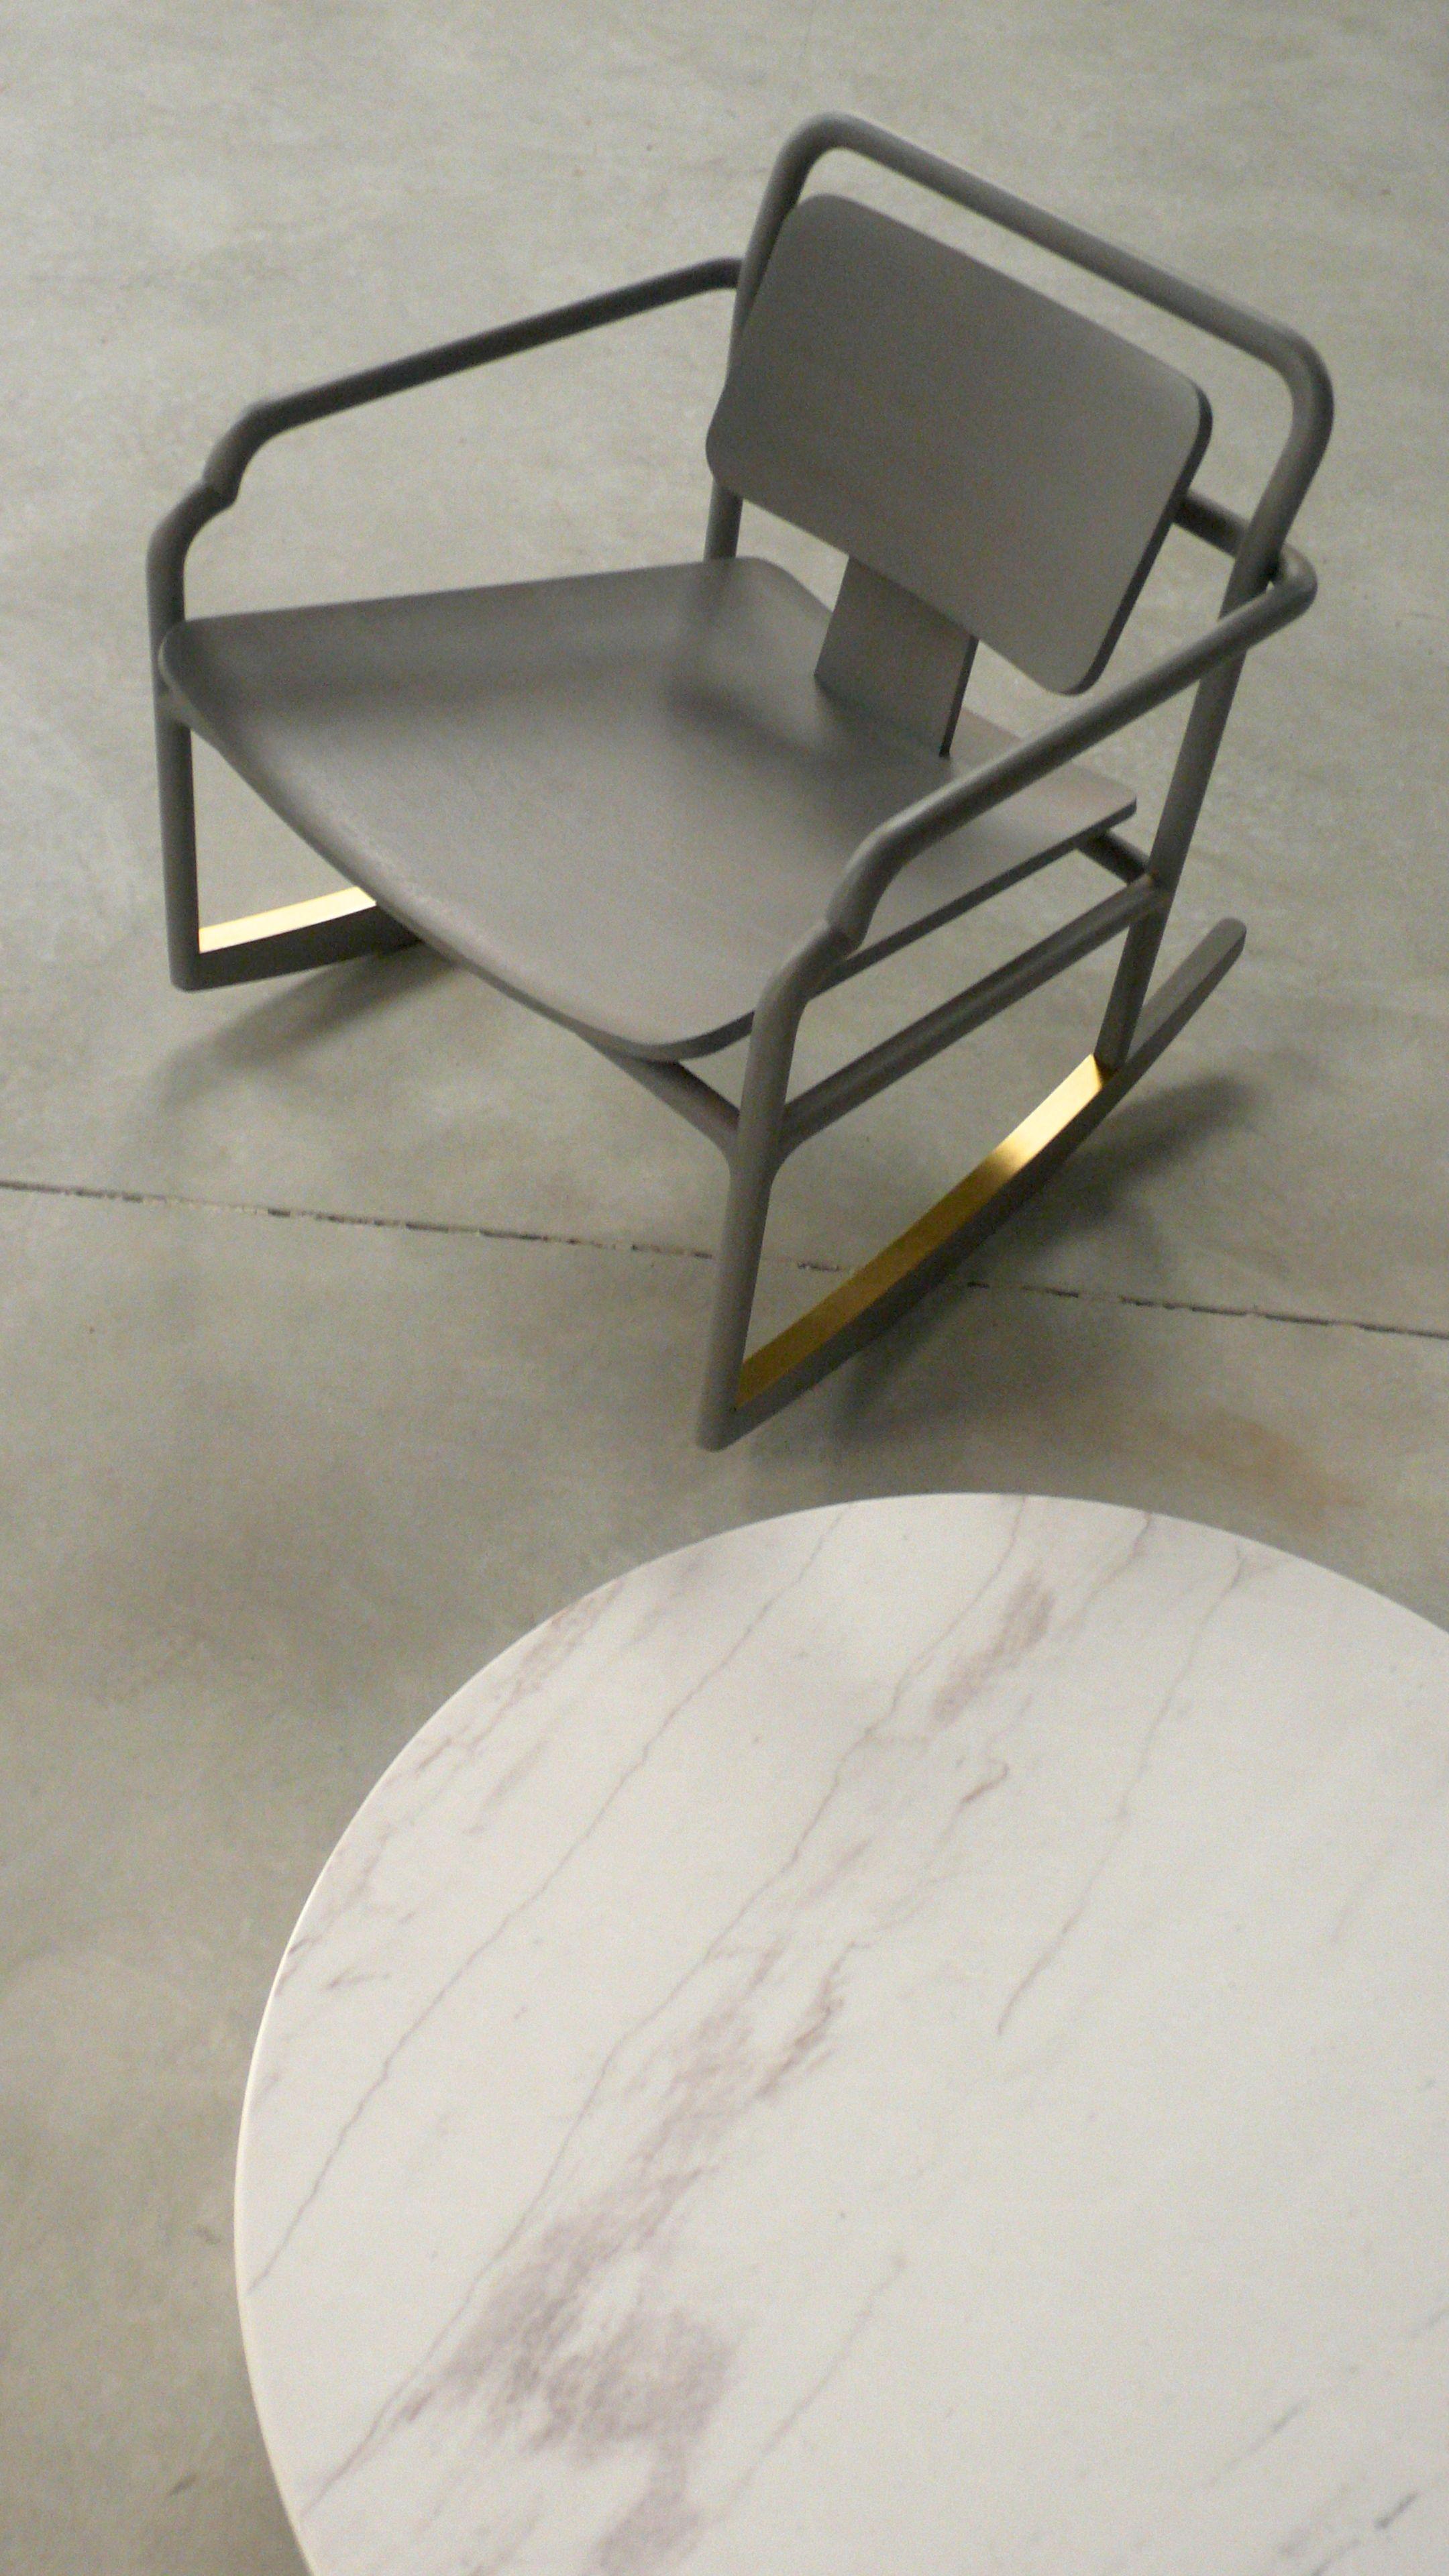 Akar De Nissim S Rocking Chair Marceau With Brass Details And